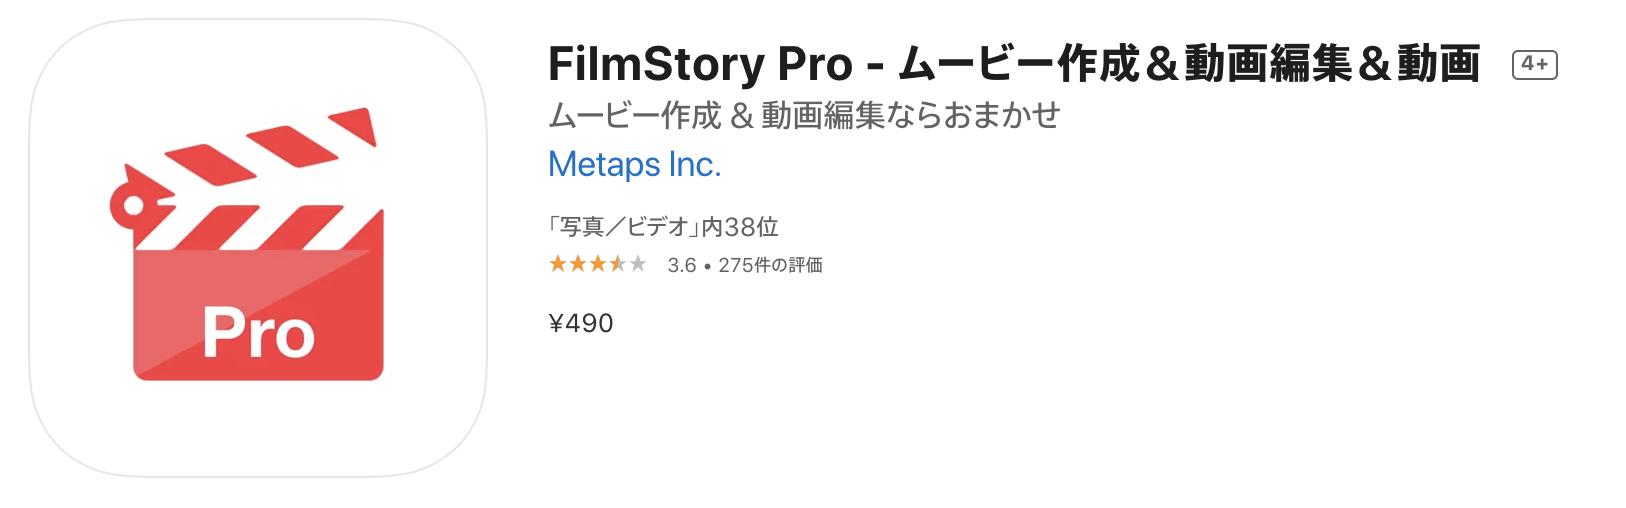 FilmStory Pro